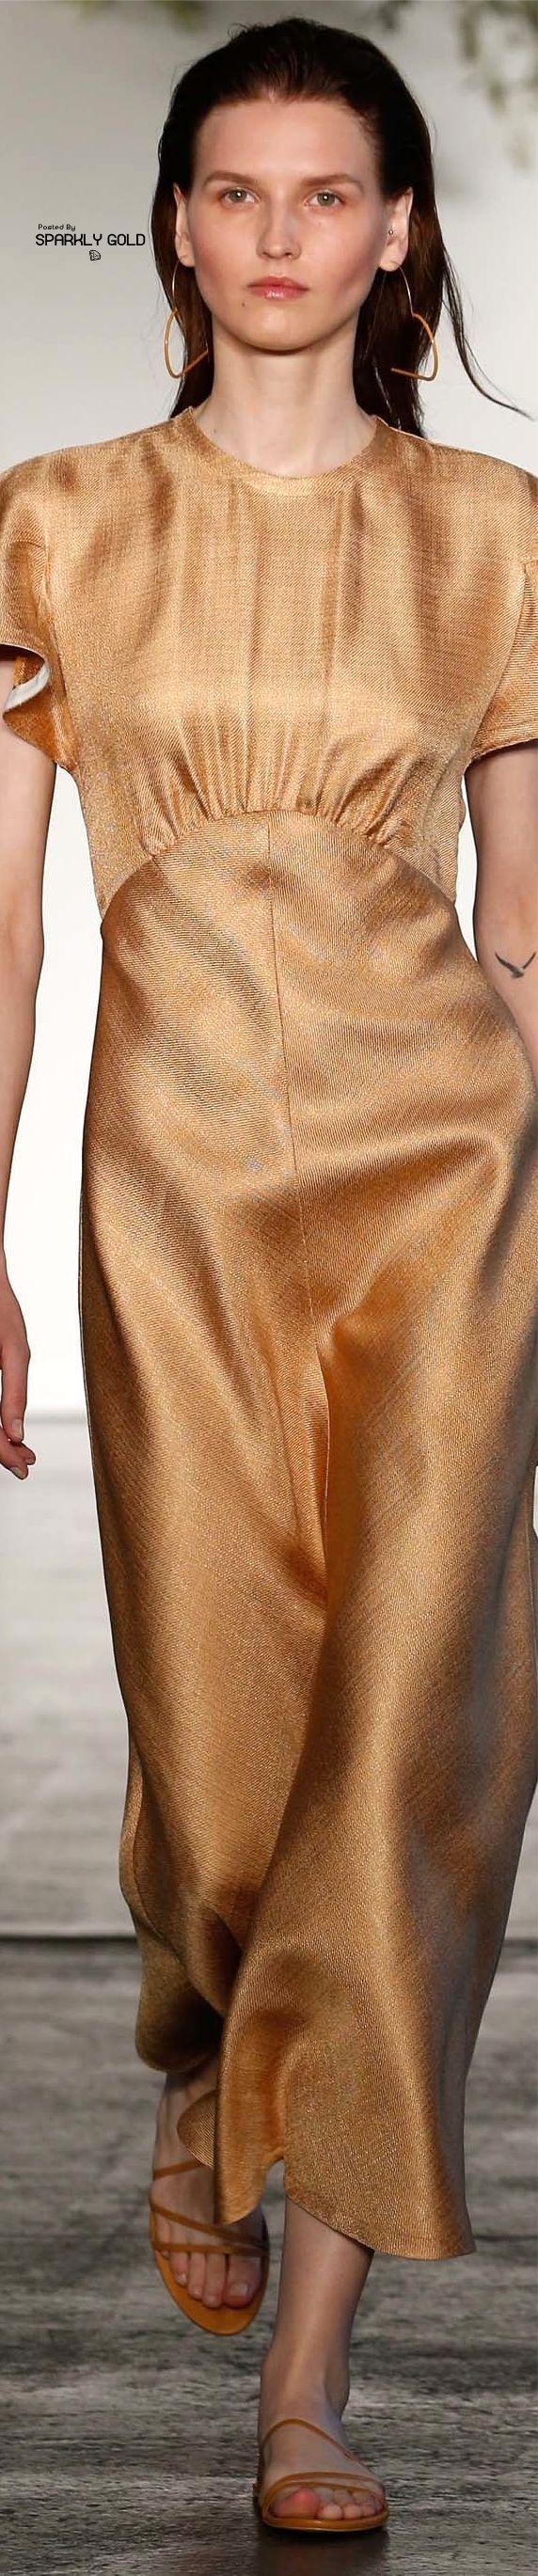 Mango maxi dress 2018 chevy